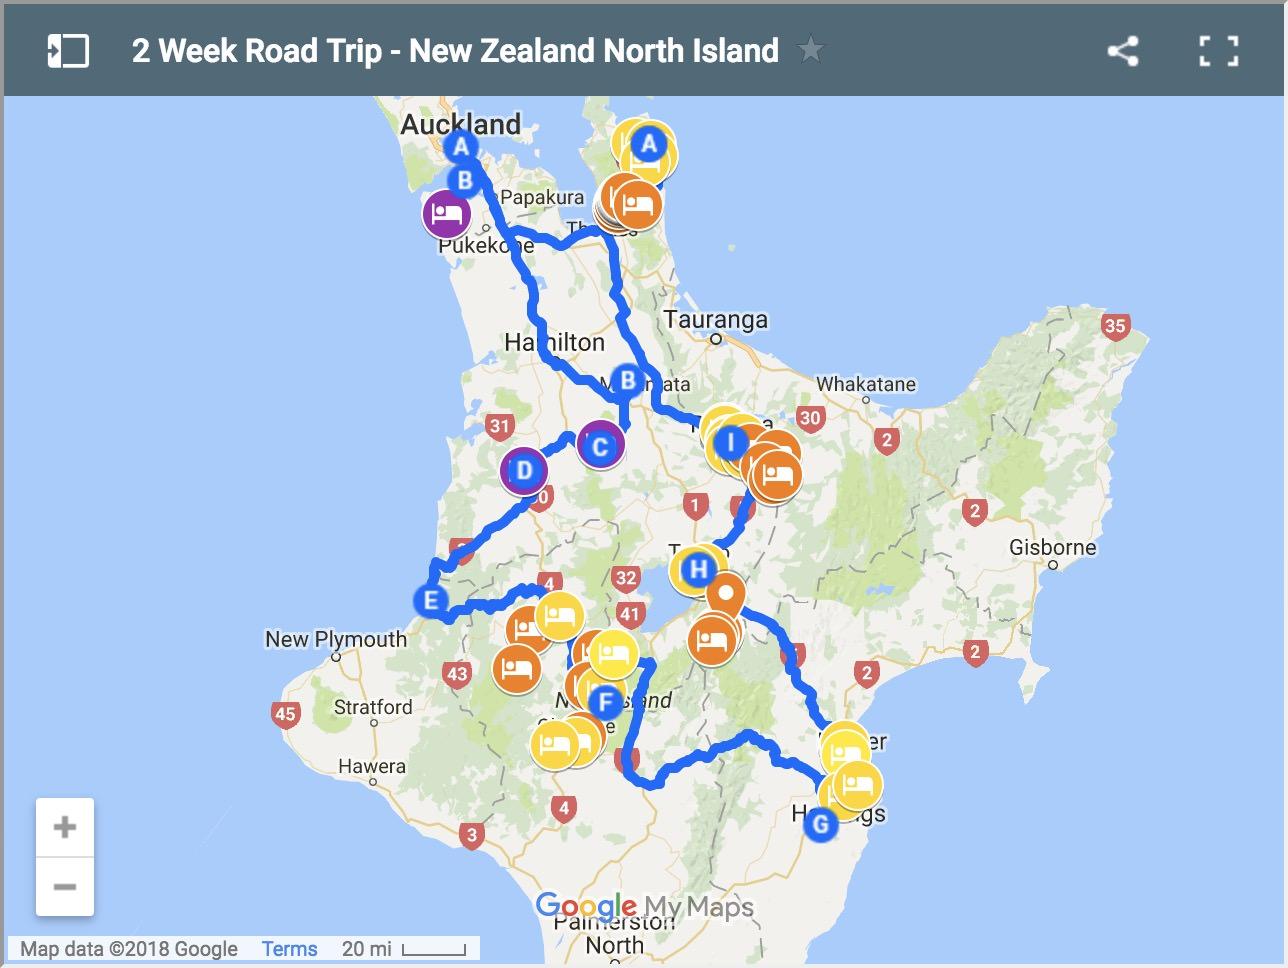 road-trip-new-zealand-north-island-map